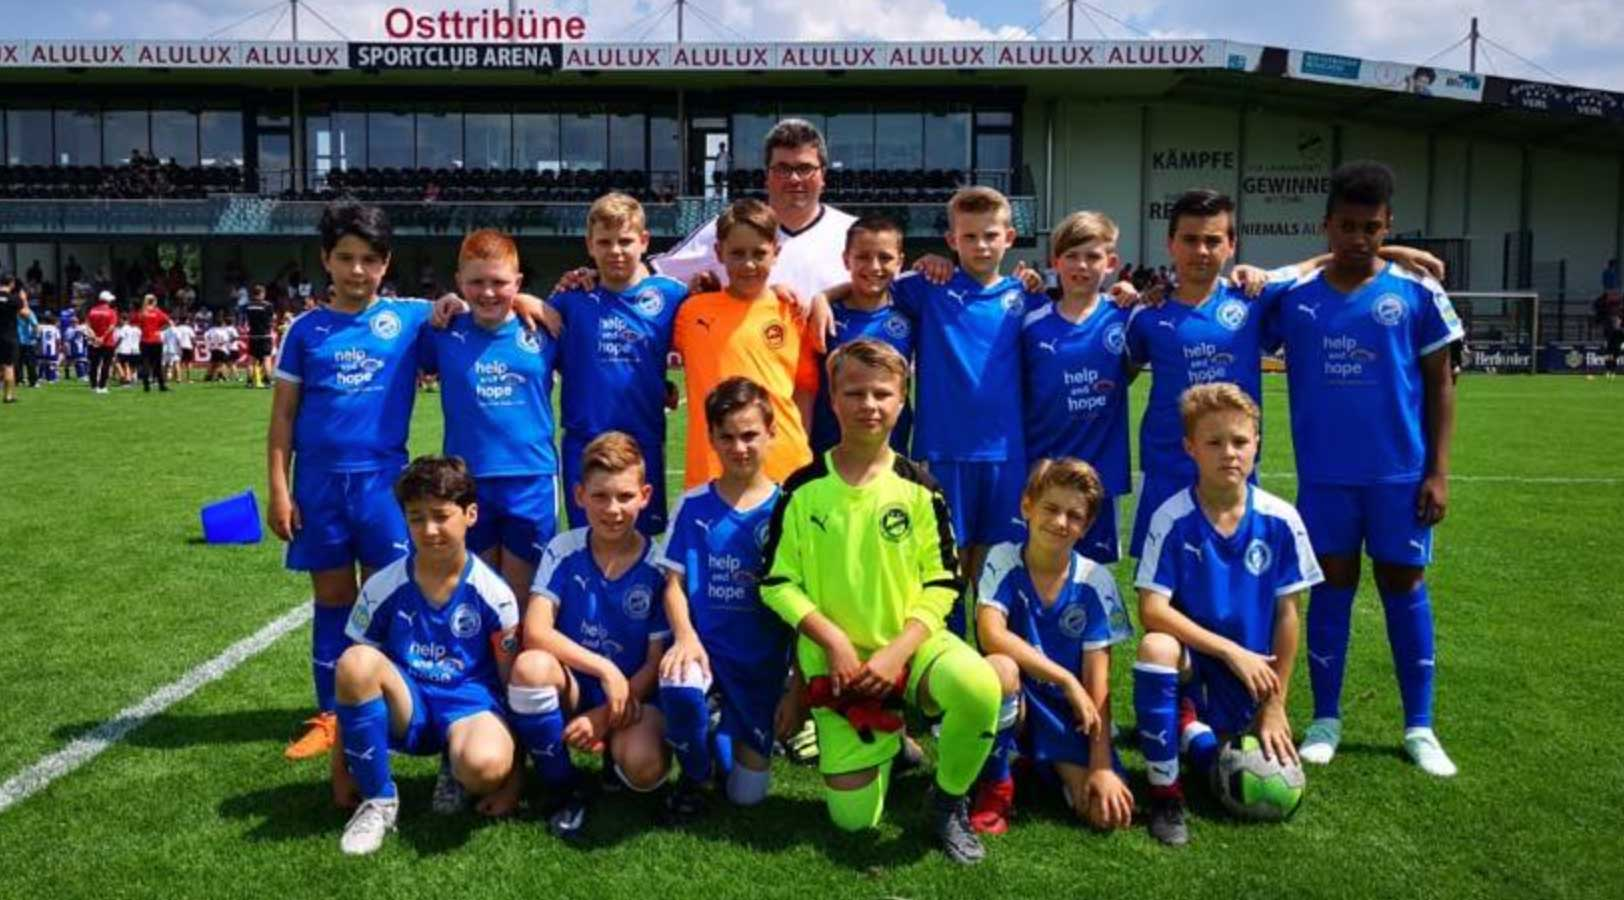 Jugendmannschaften des FC Brünninghausen